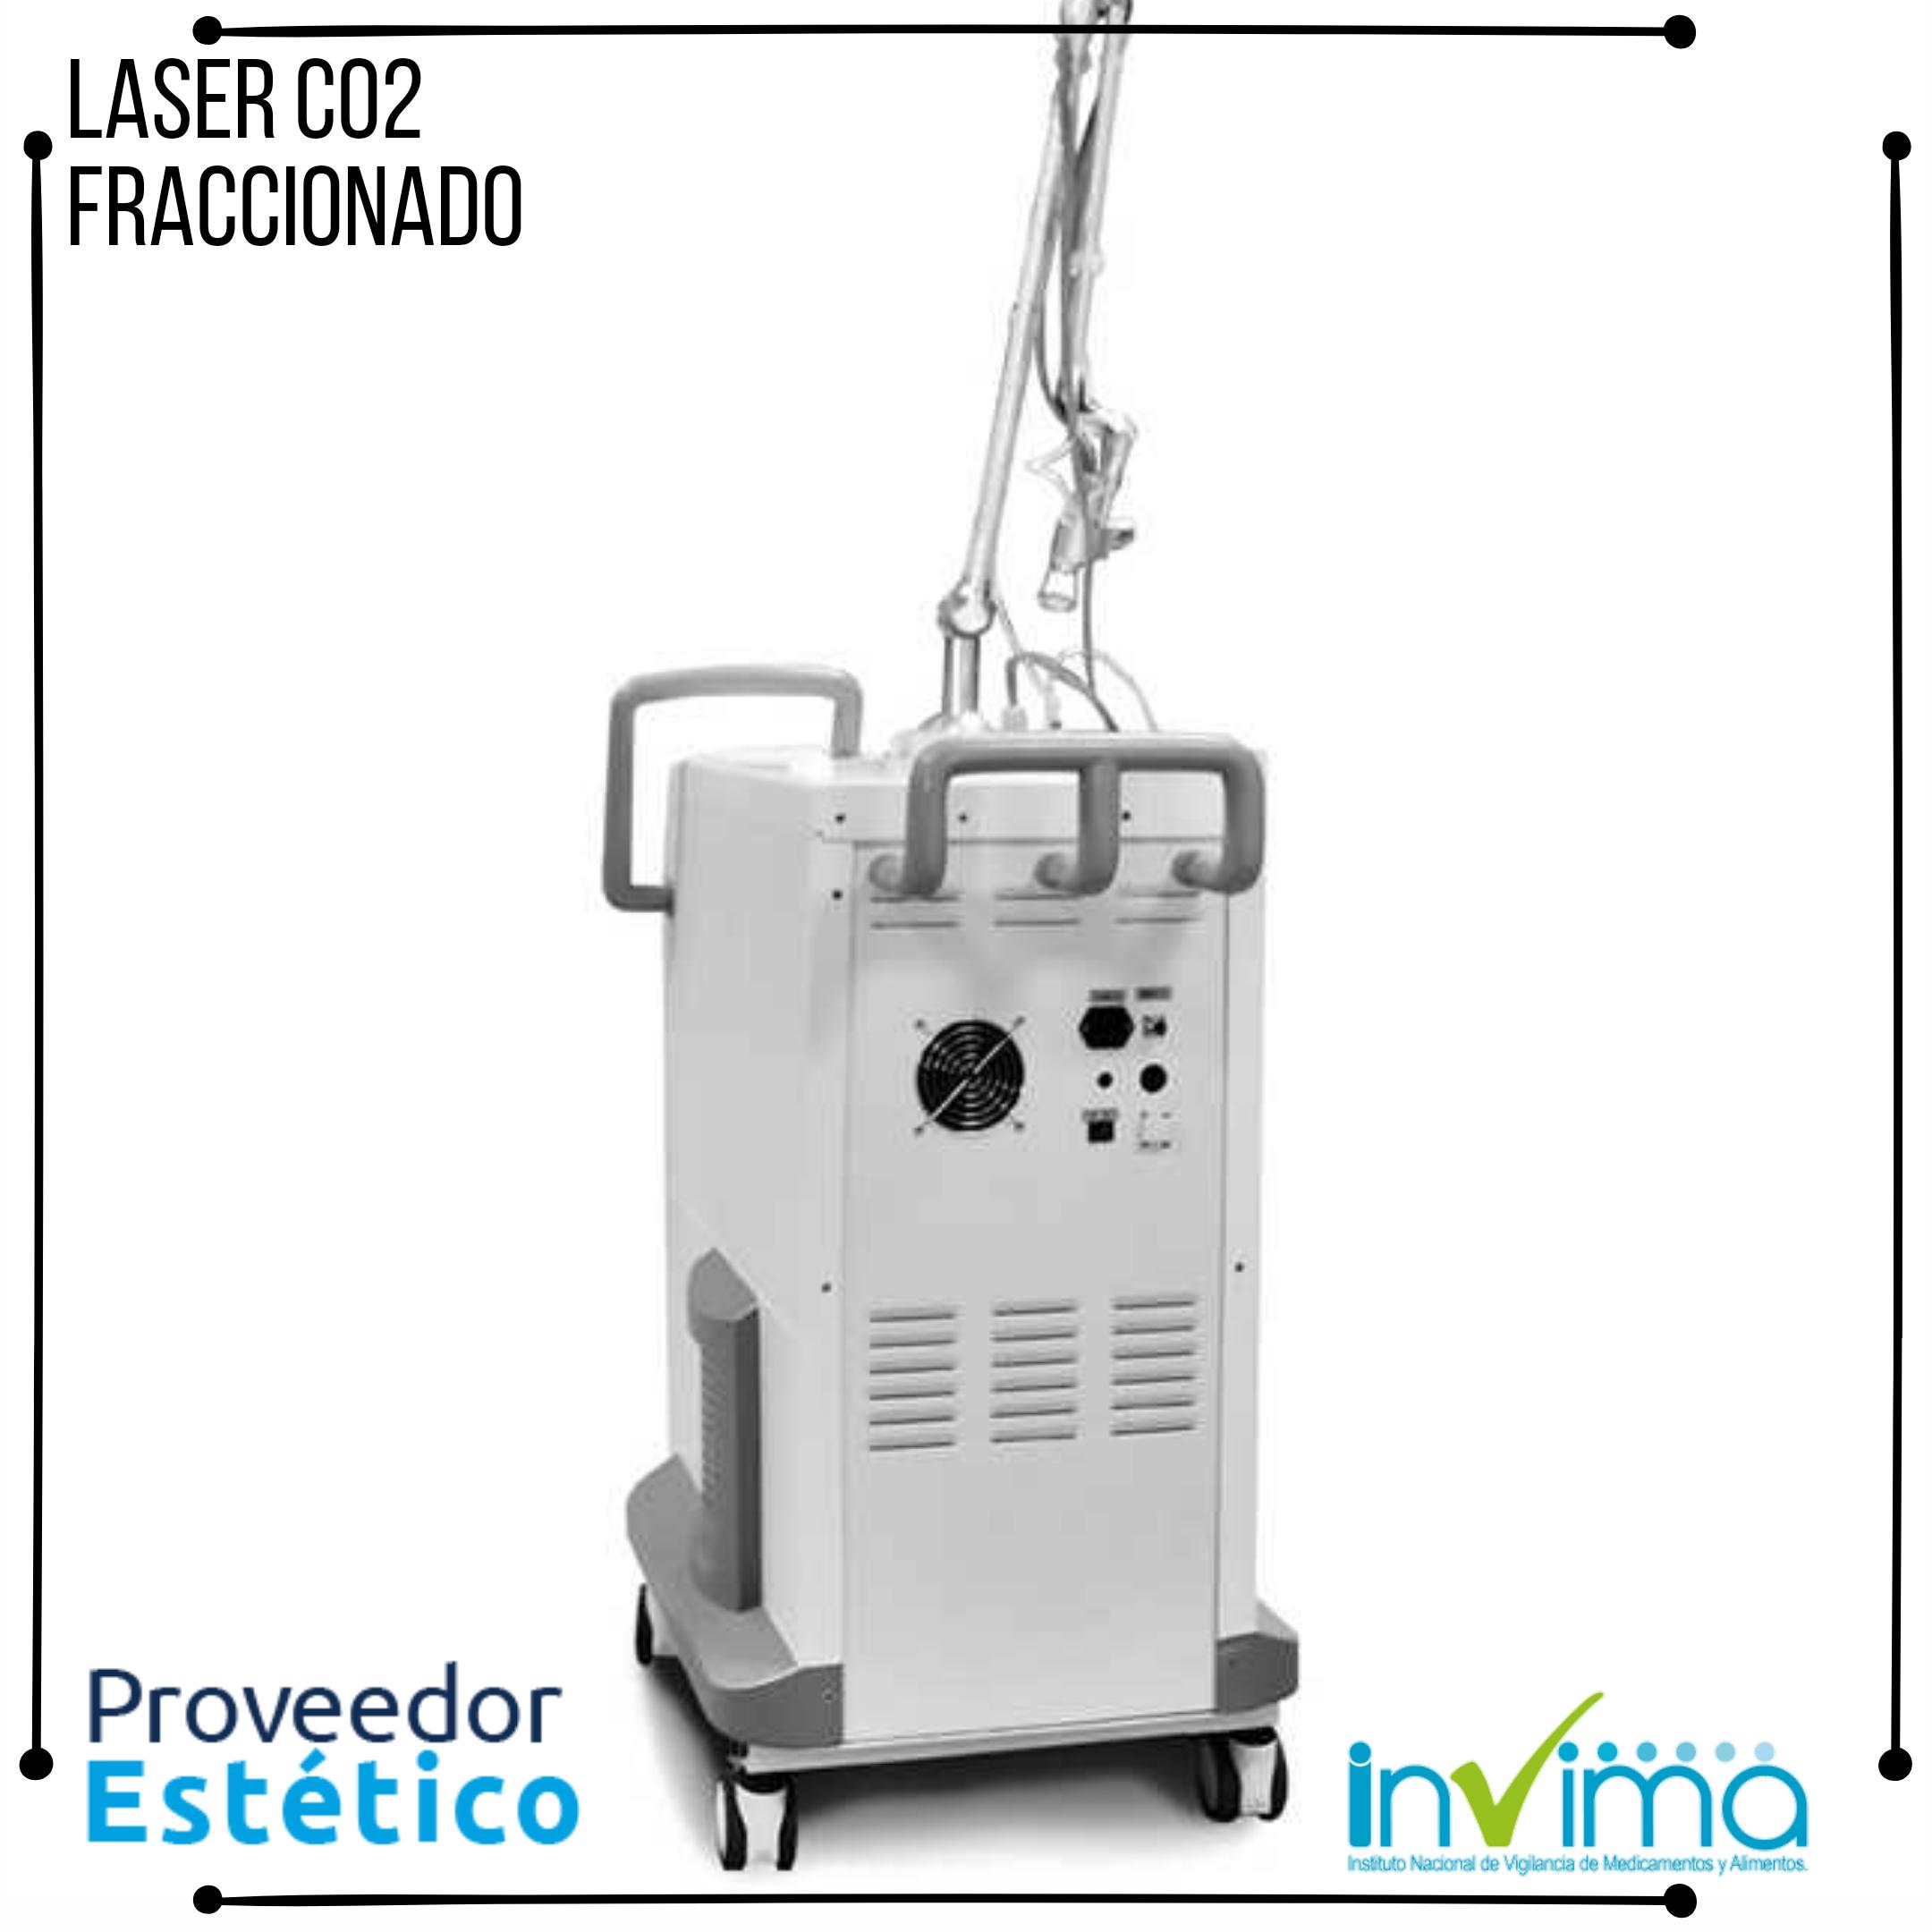 https://0201.nccdn.net/1_2/000/000/19a/017/laserco2fraccionado_2.png